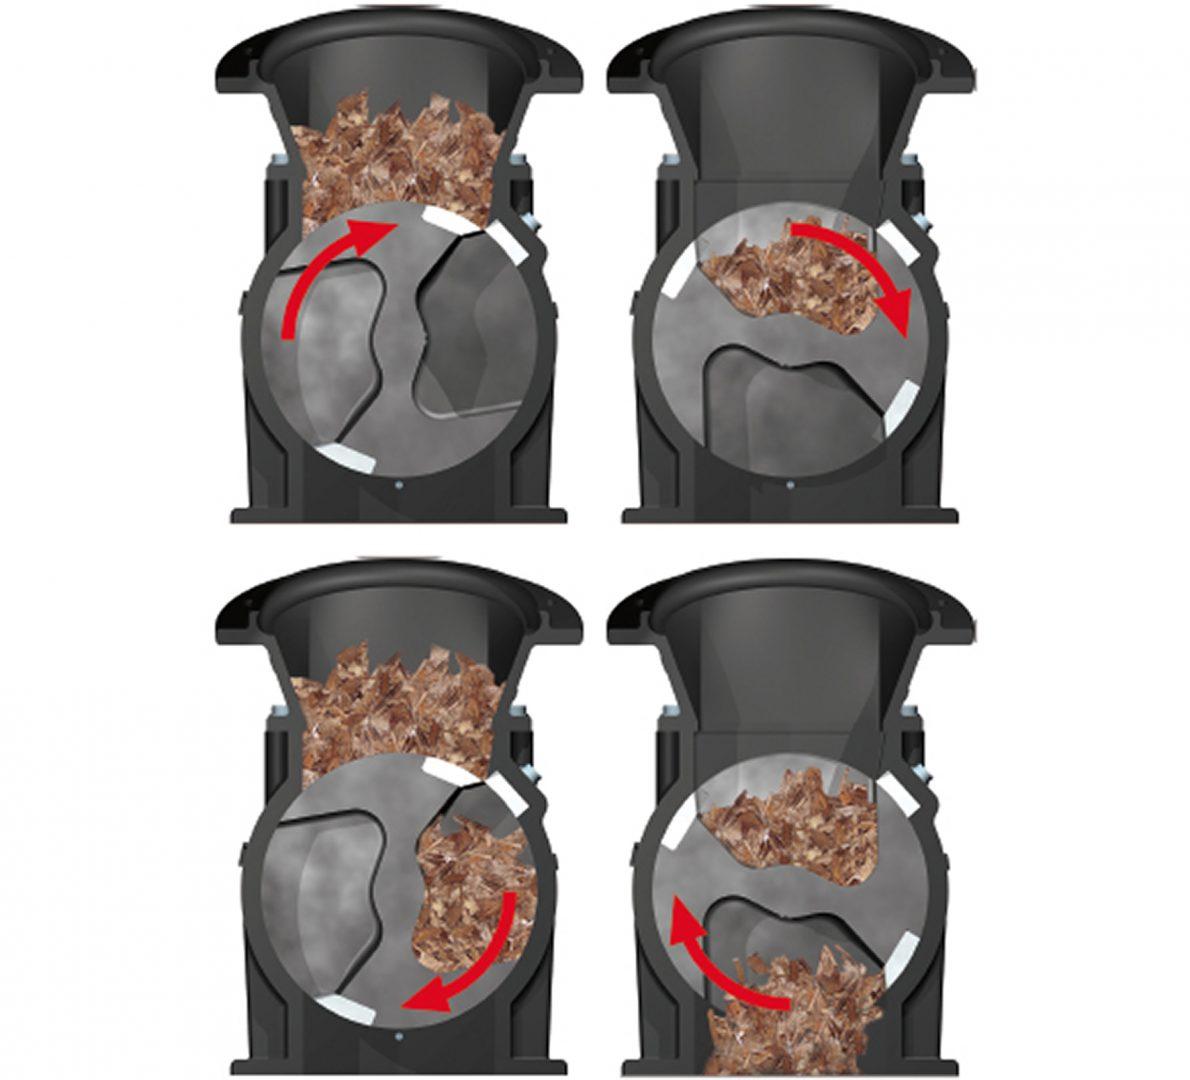 ood chip boiler air locks